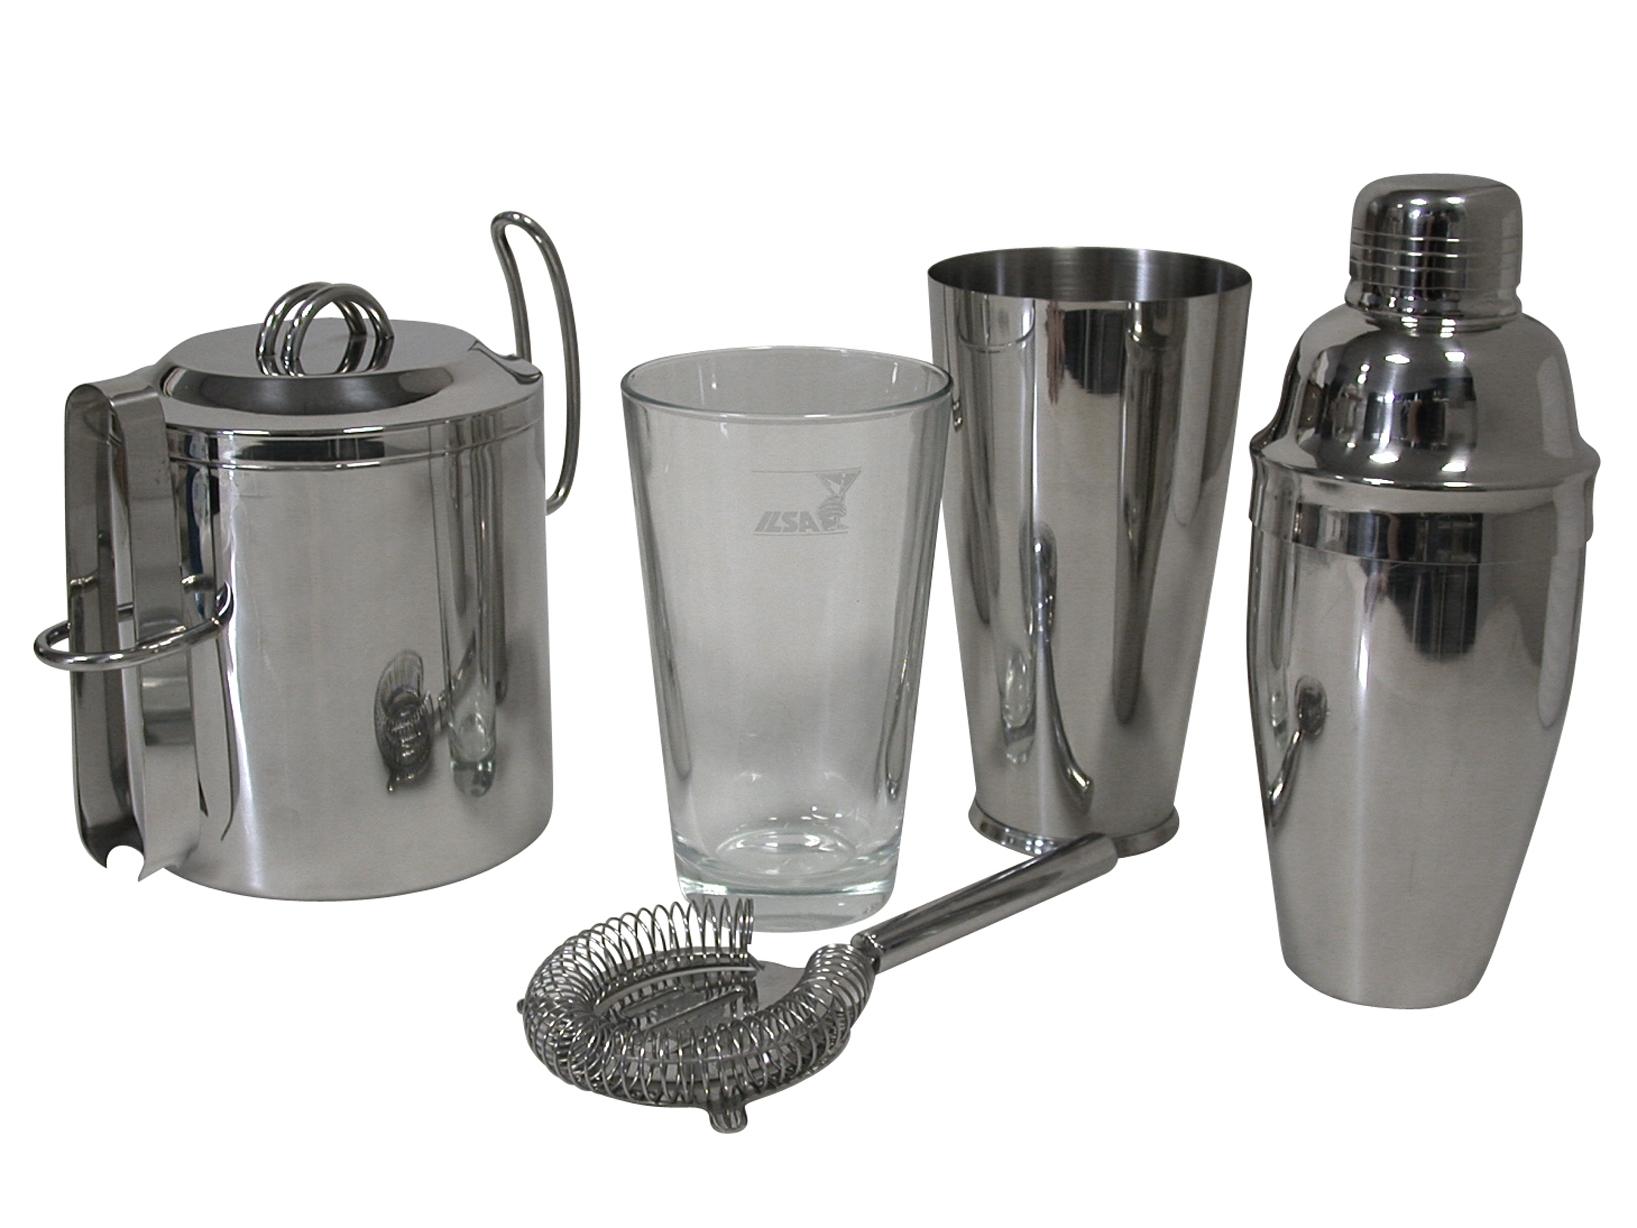 Acquista Shaker Inox 50 Utensili Da Cucina 17514002 | Glooke.com